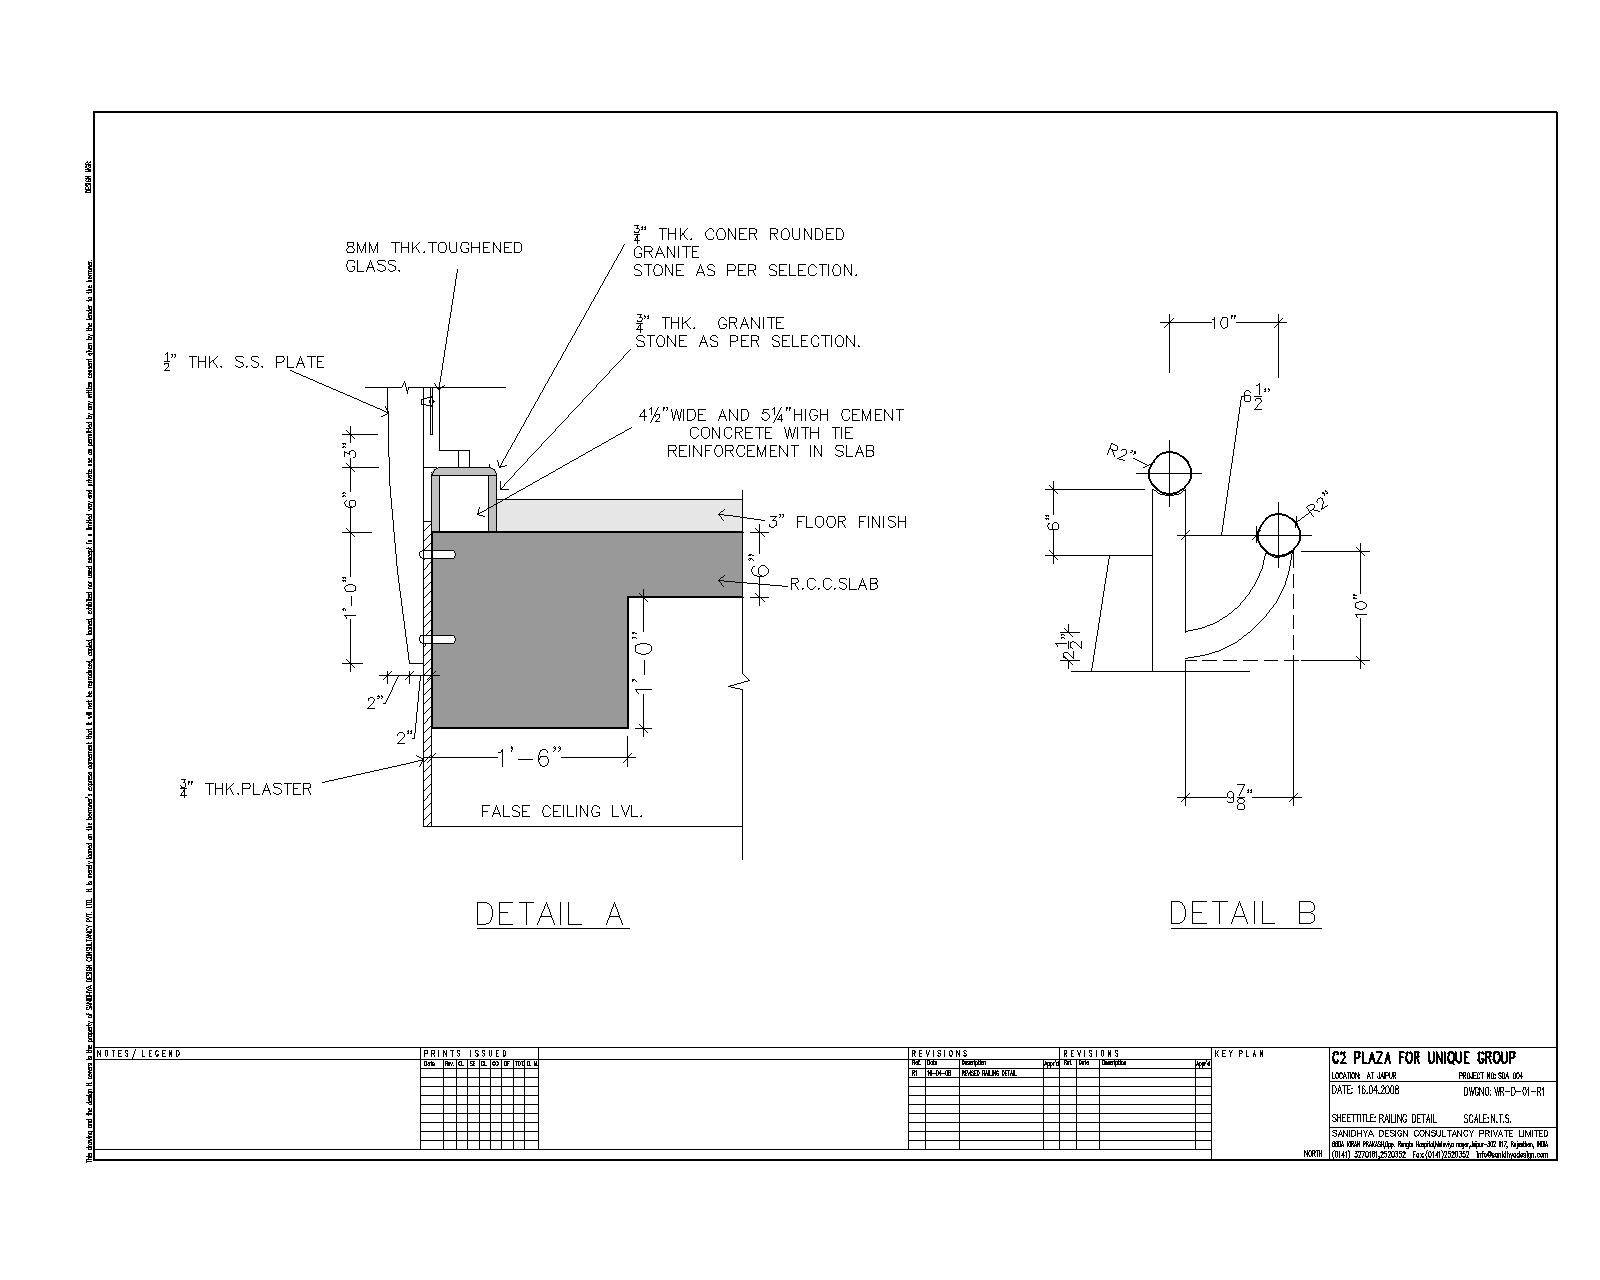 Sanidhya Design: Railing details